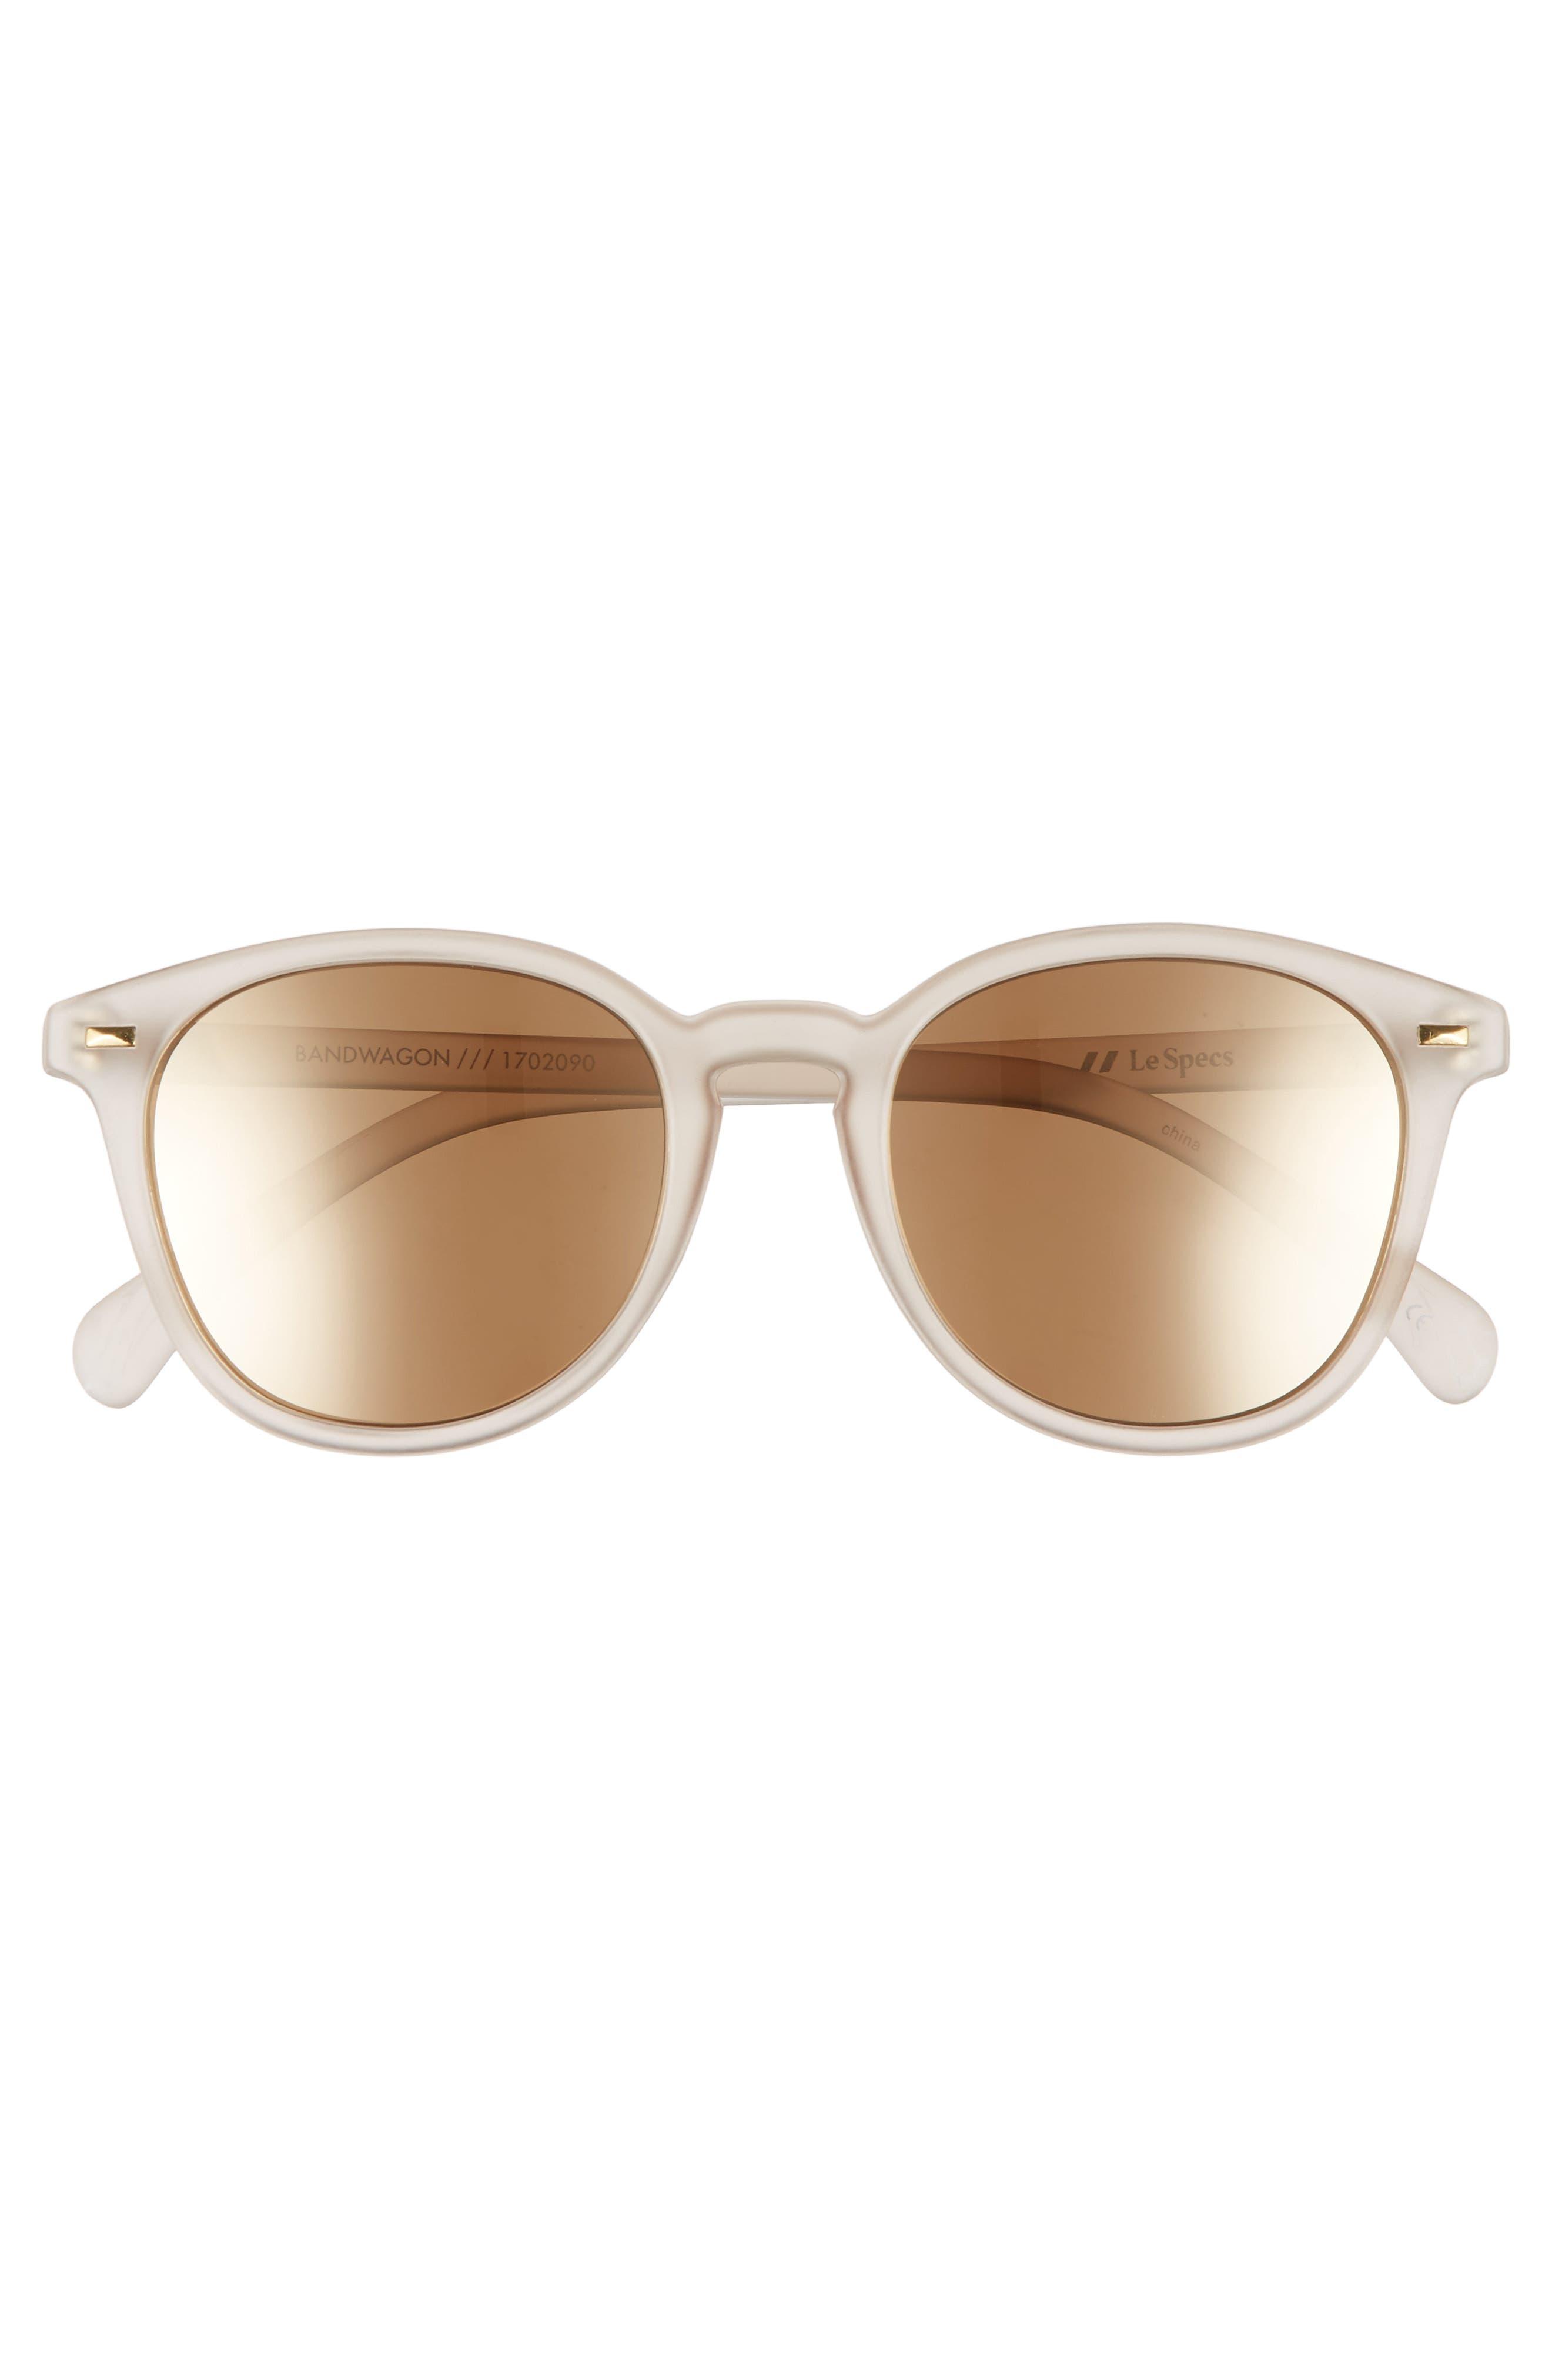 LE SPECS, Bandwagon 51mm Sunglasses, Alternate thumbnail 3, color, MATTE STONE